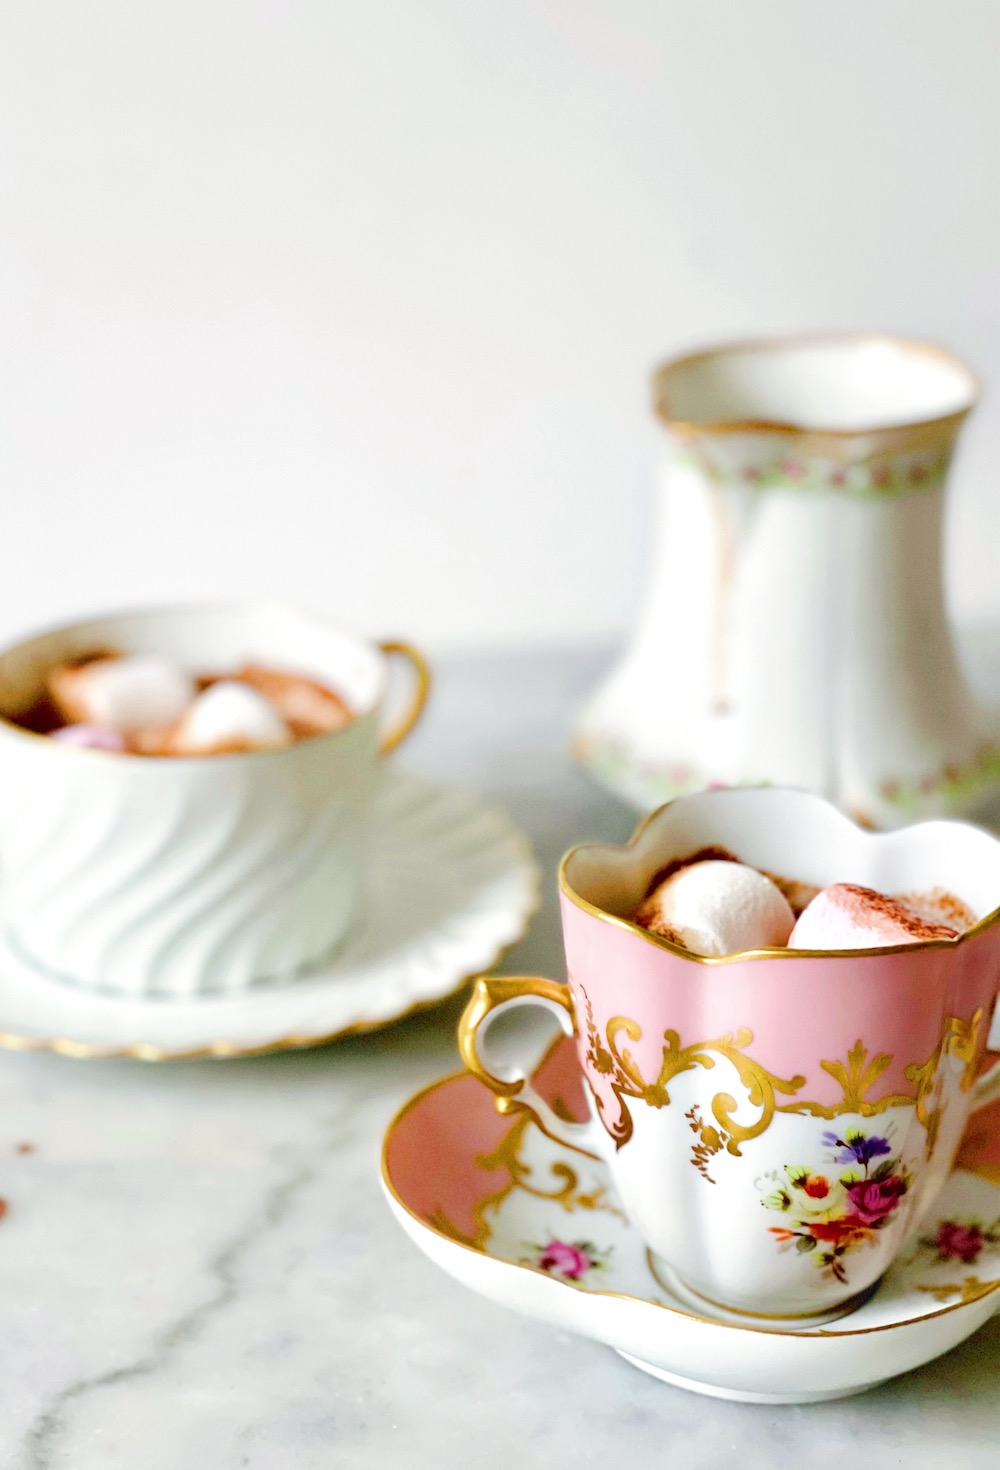 Chocolat Chaud (My hot chocolate recipe)